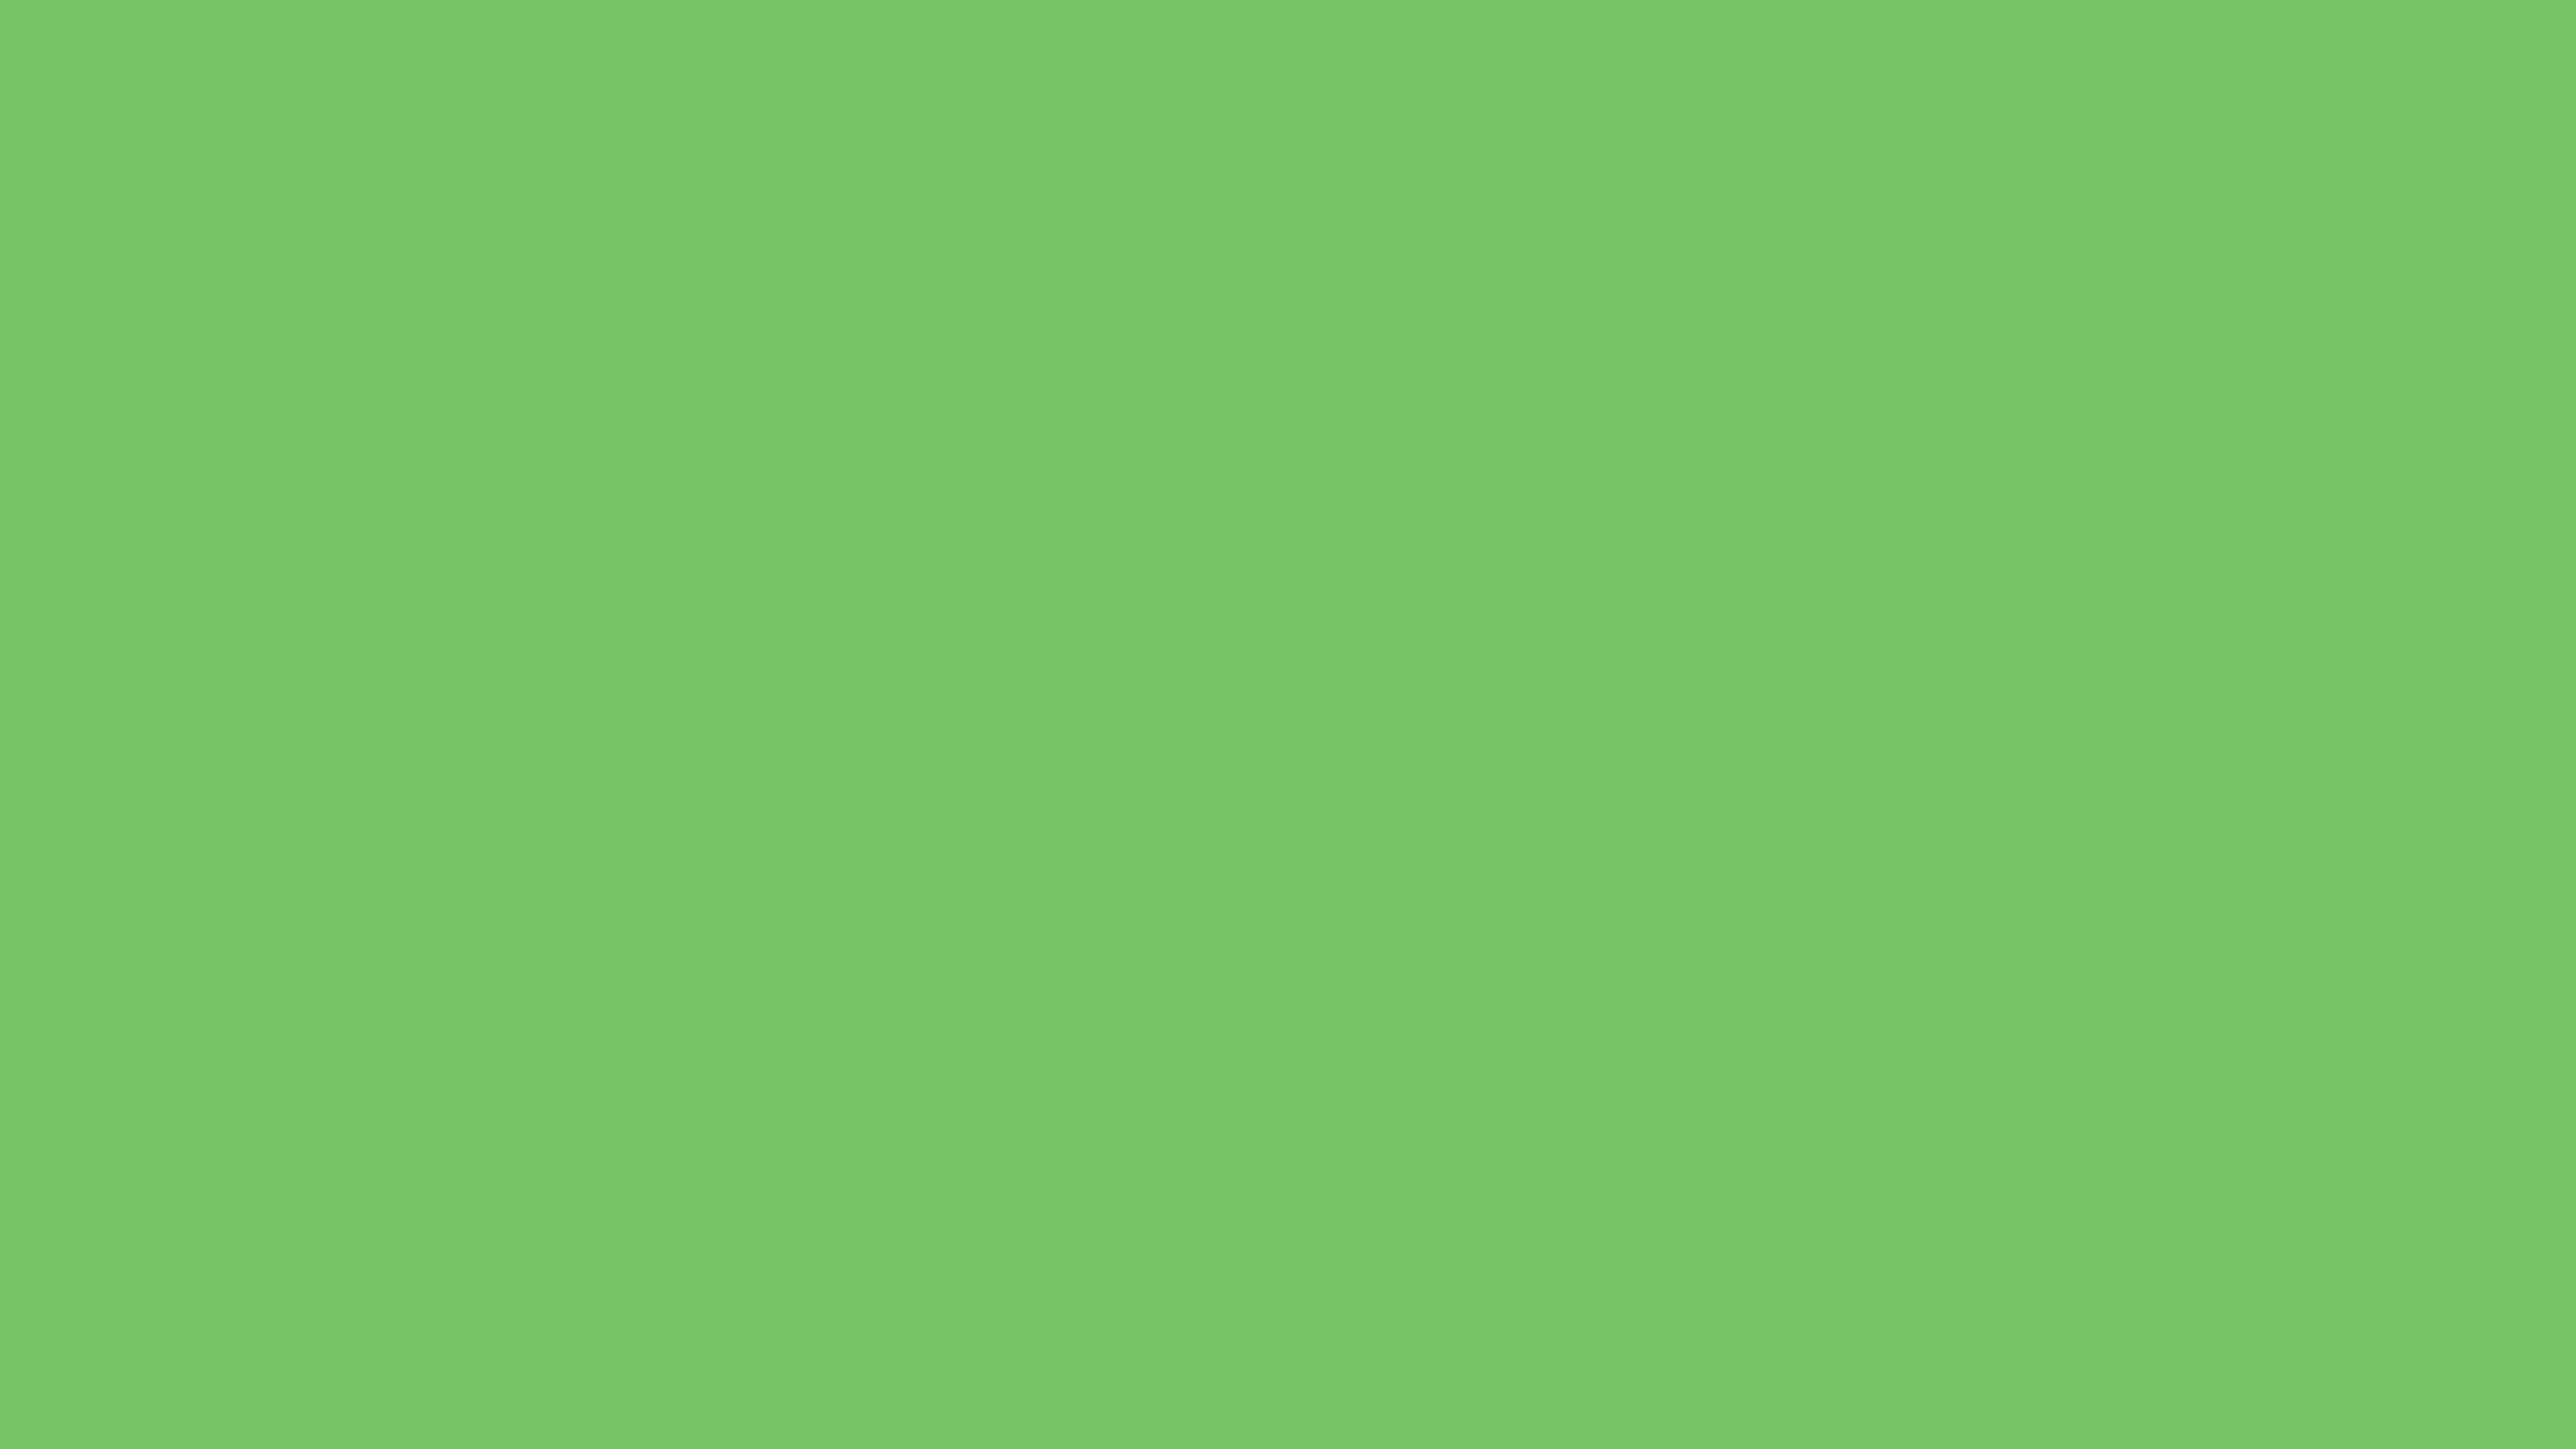 4096x2304 Mantis Solid Color Background